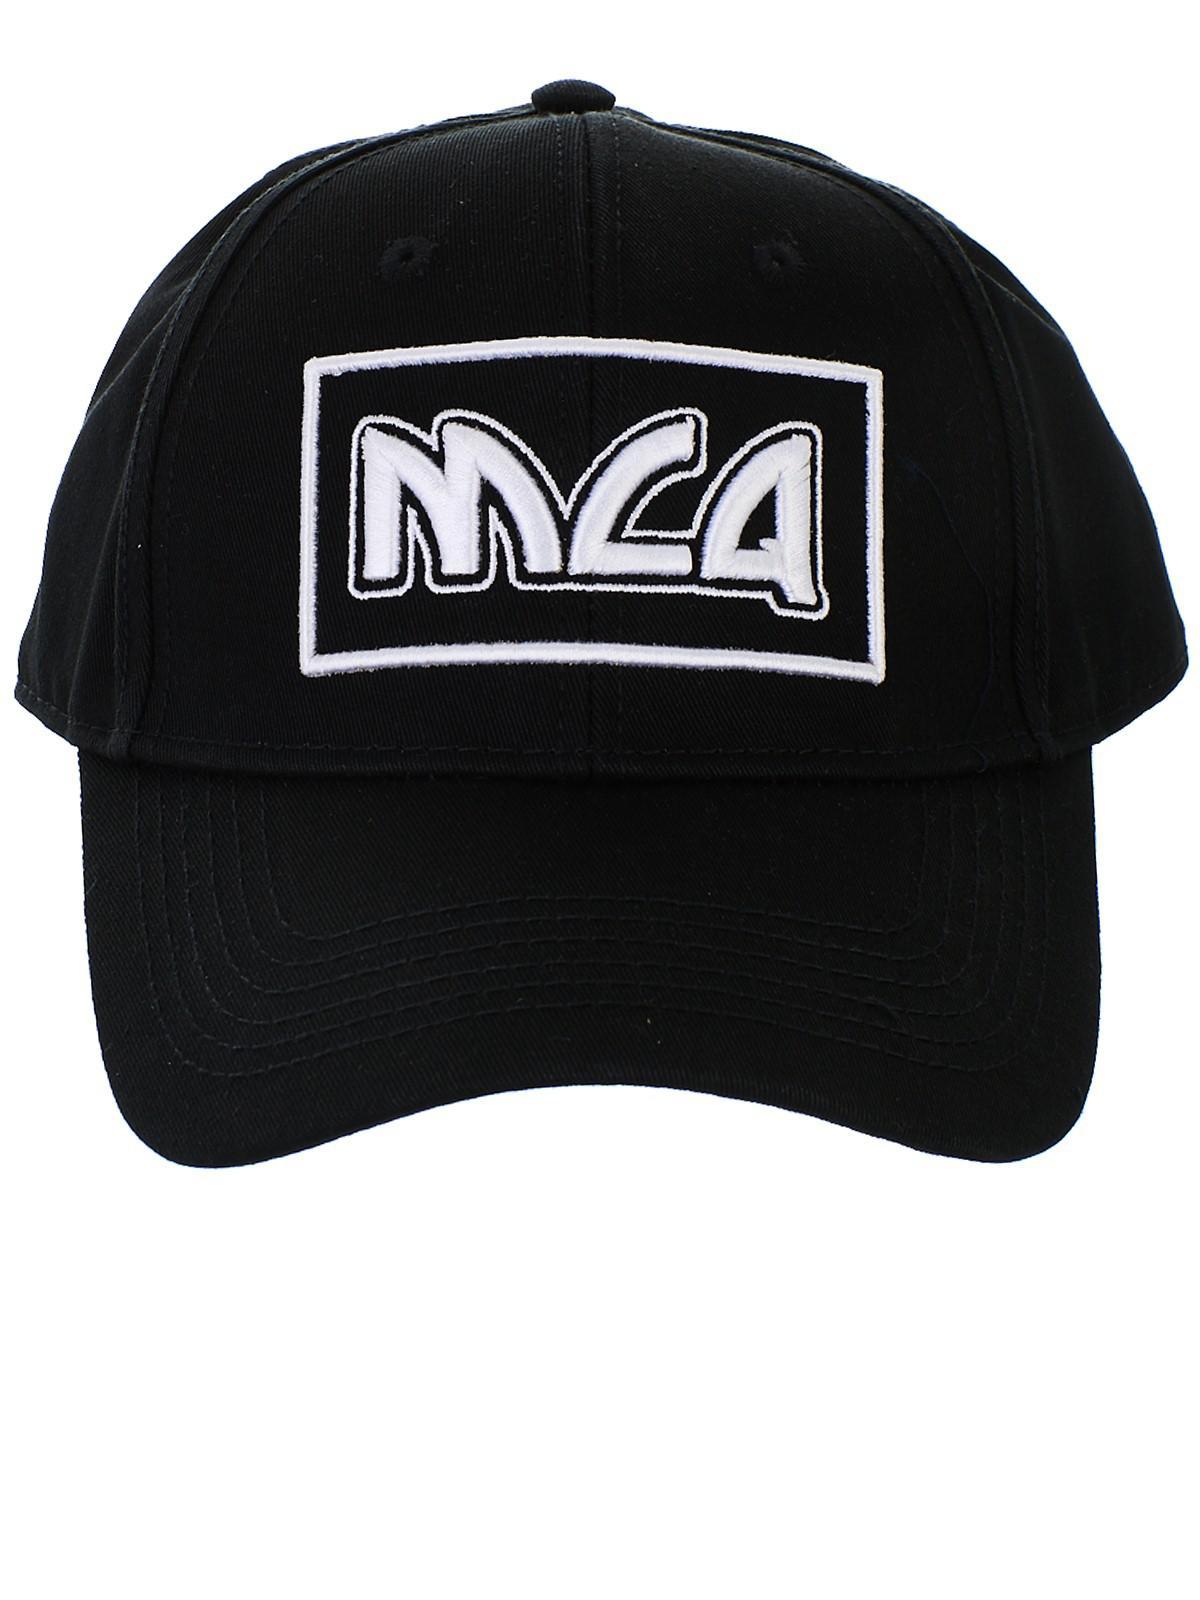 McQ Alexander McQueen - Black Metal Baseball Cap for Men - Lyst. View  fullscreen 842f6c55128c